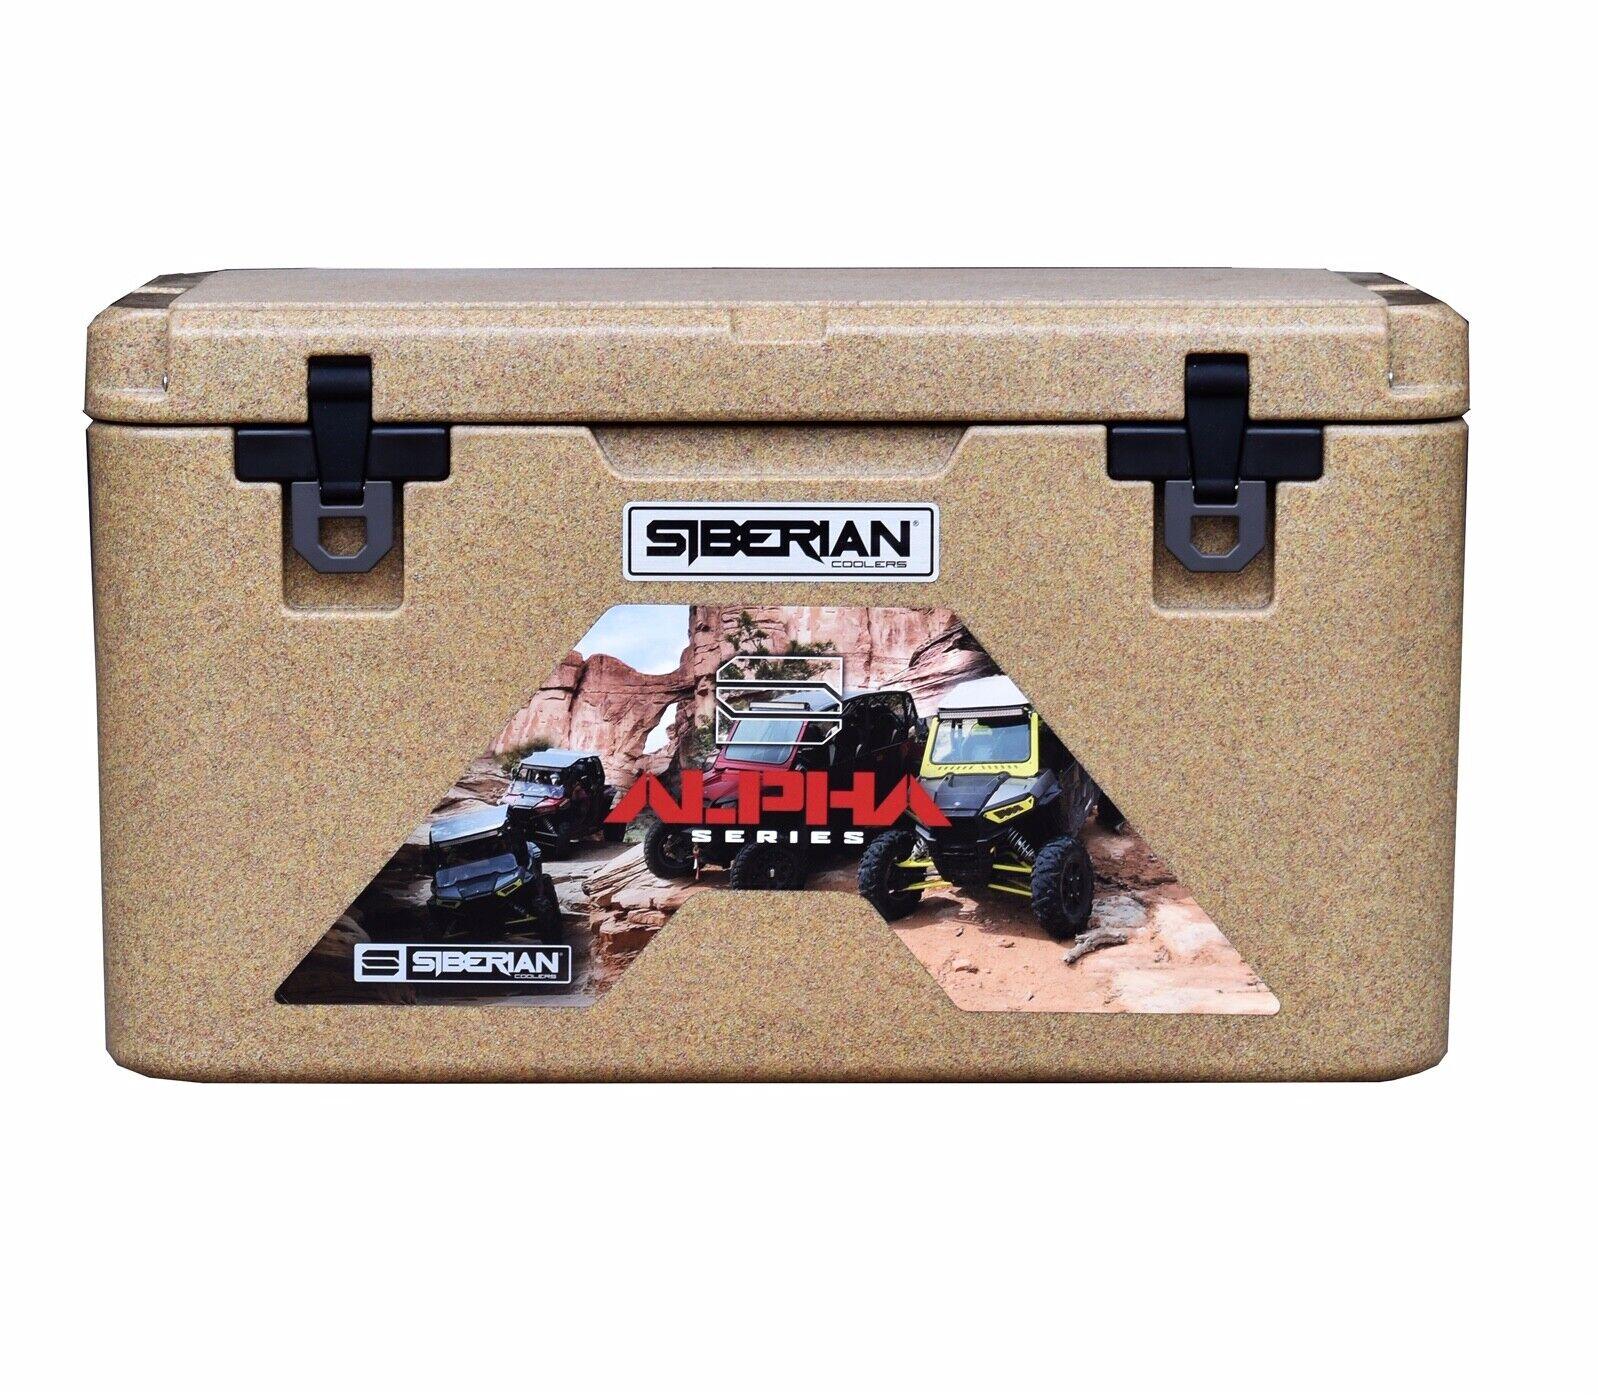 Siberian Coolers Alpha Pro Series  45 quart Sahara Tan  FREE Accessories  we supply the best